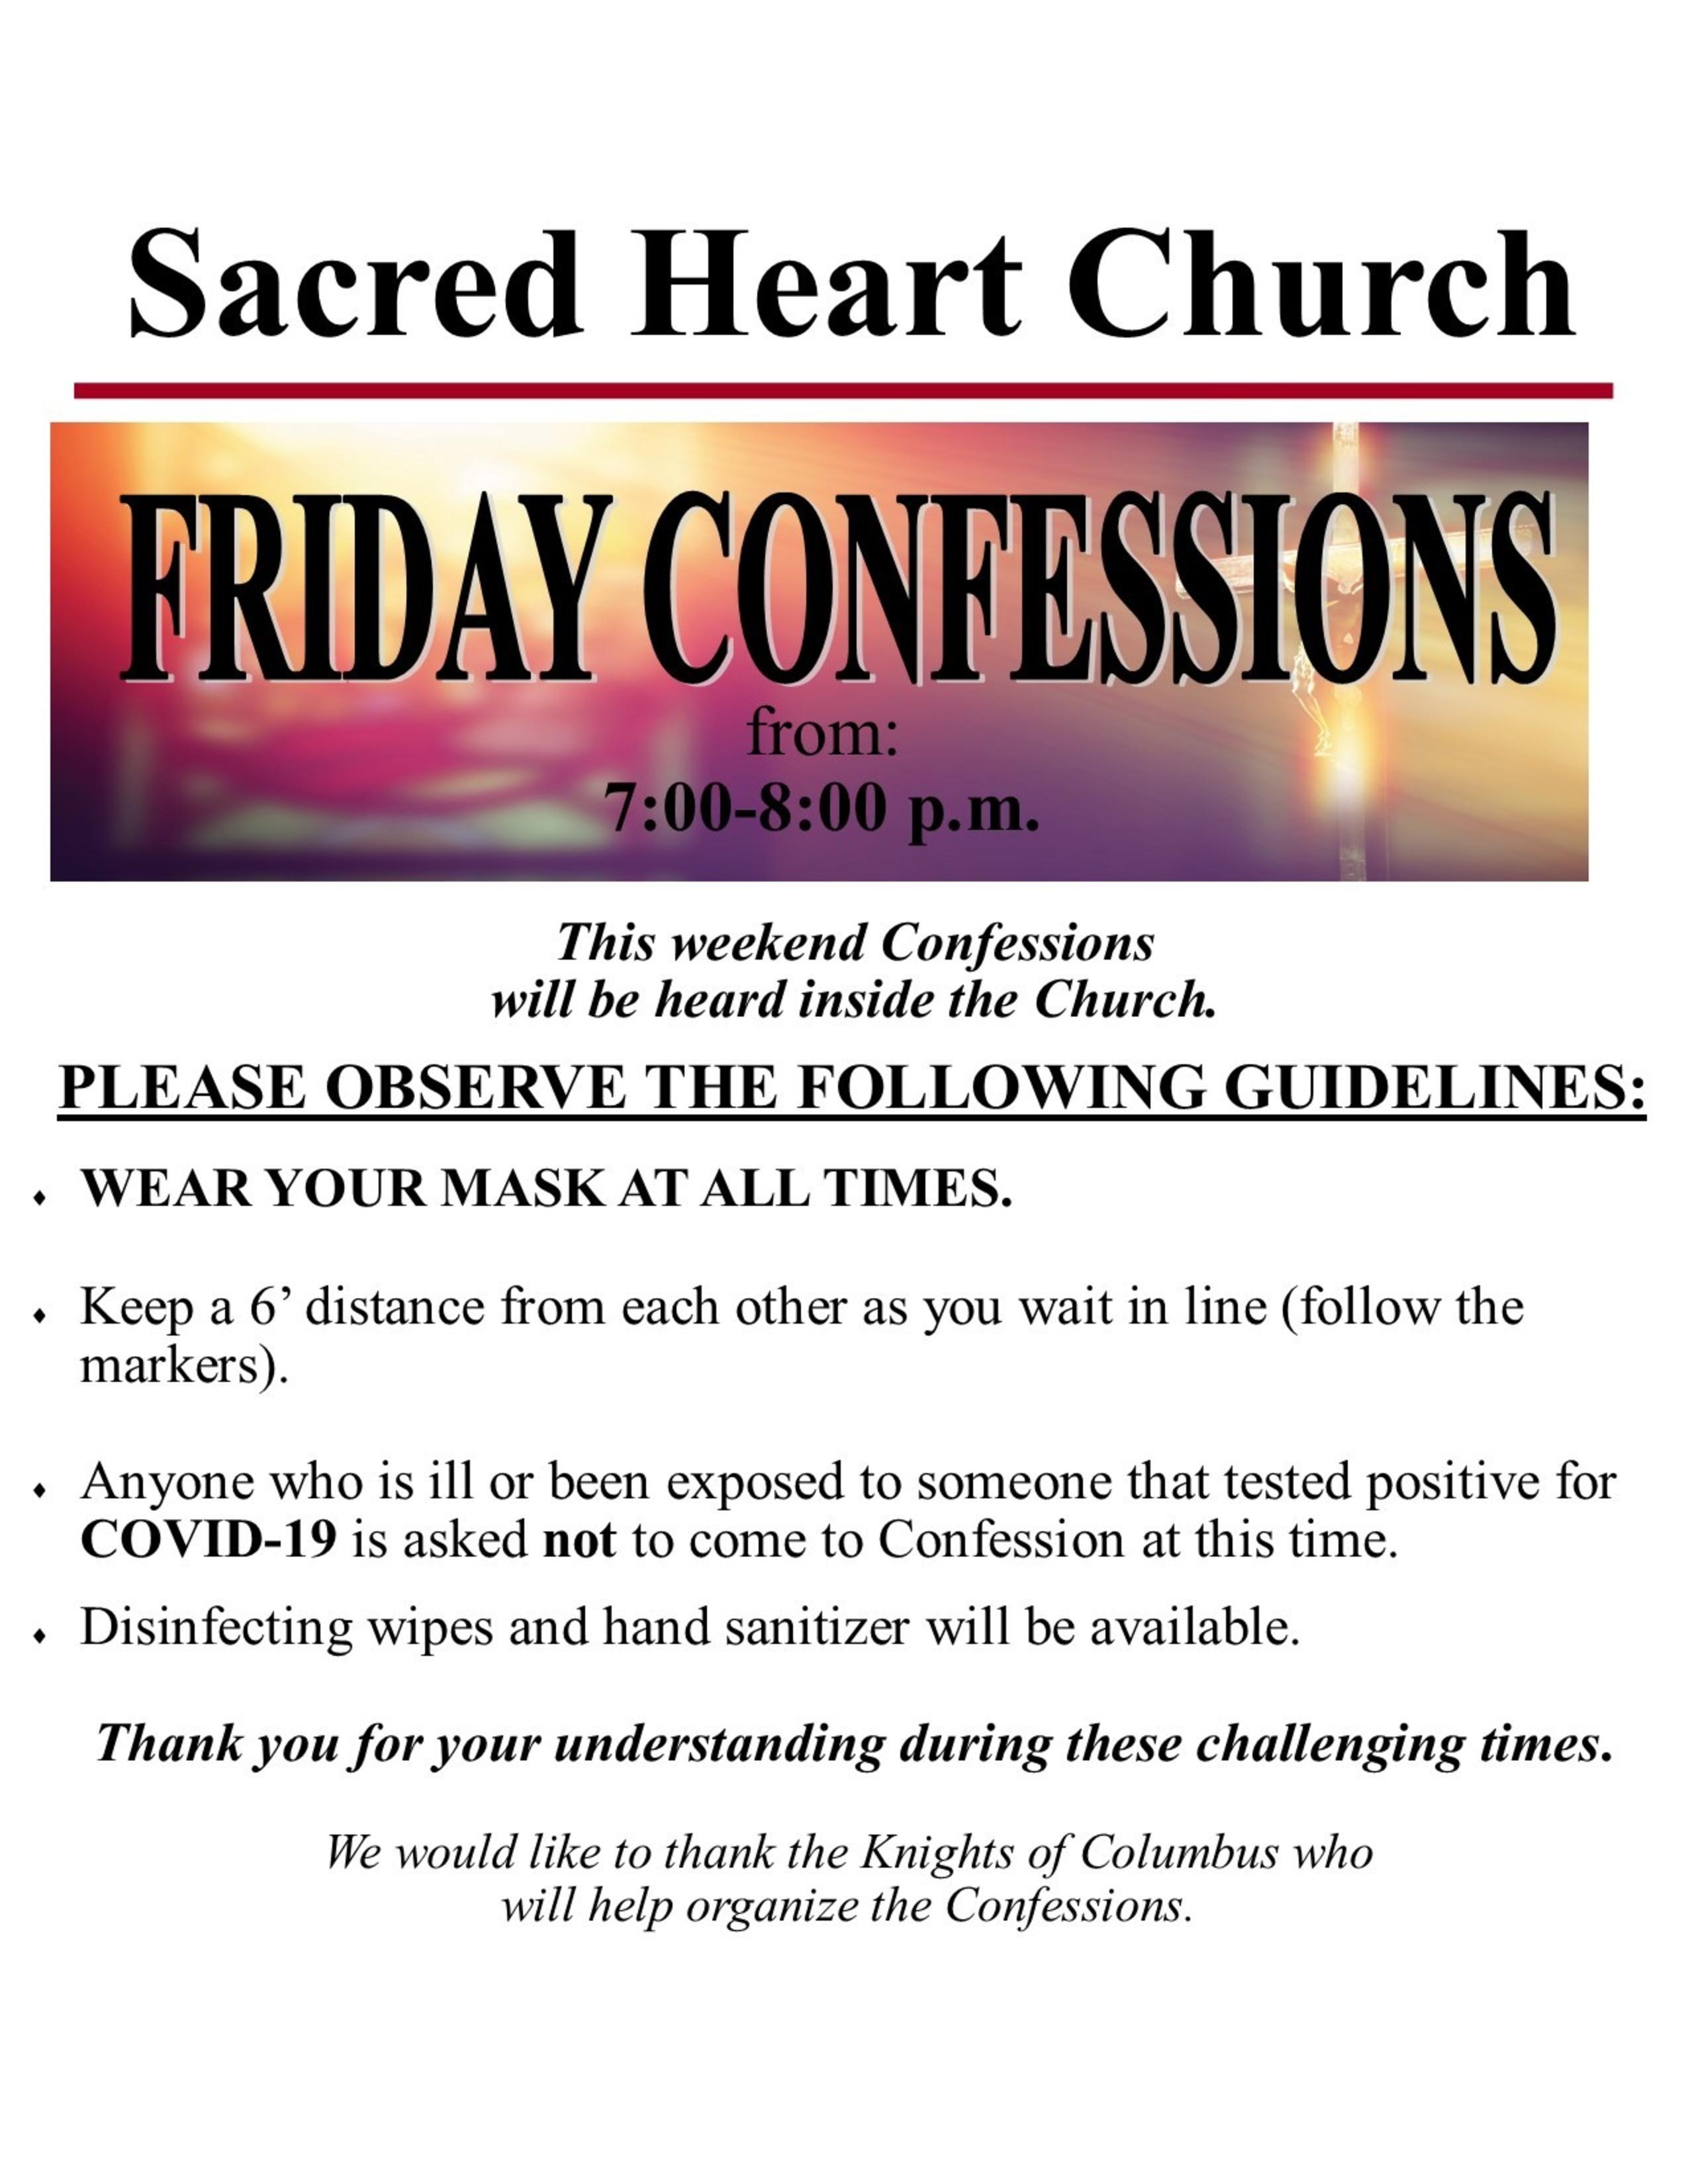 Confesiones Covid 2020 Friday